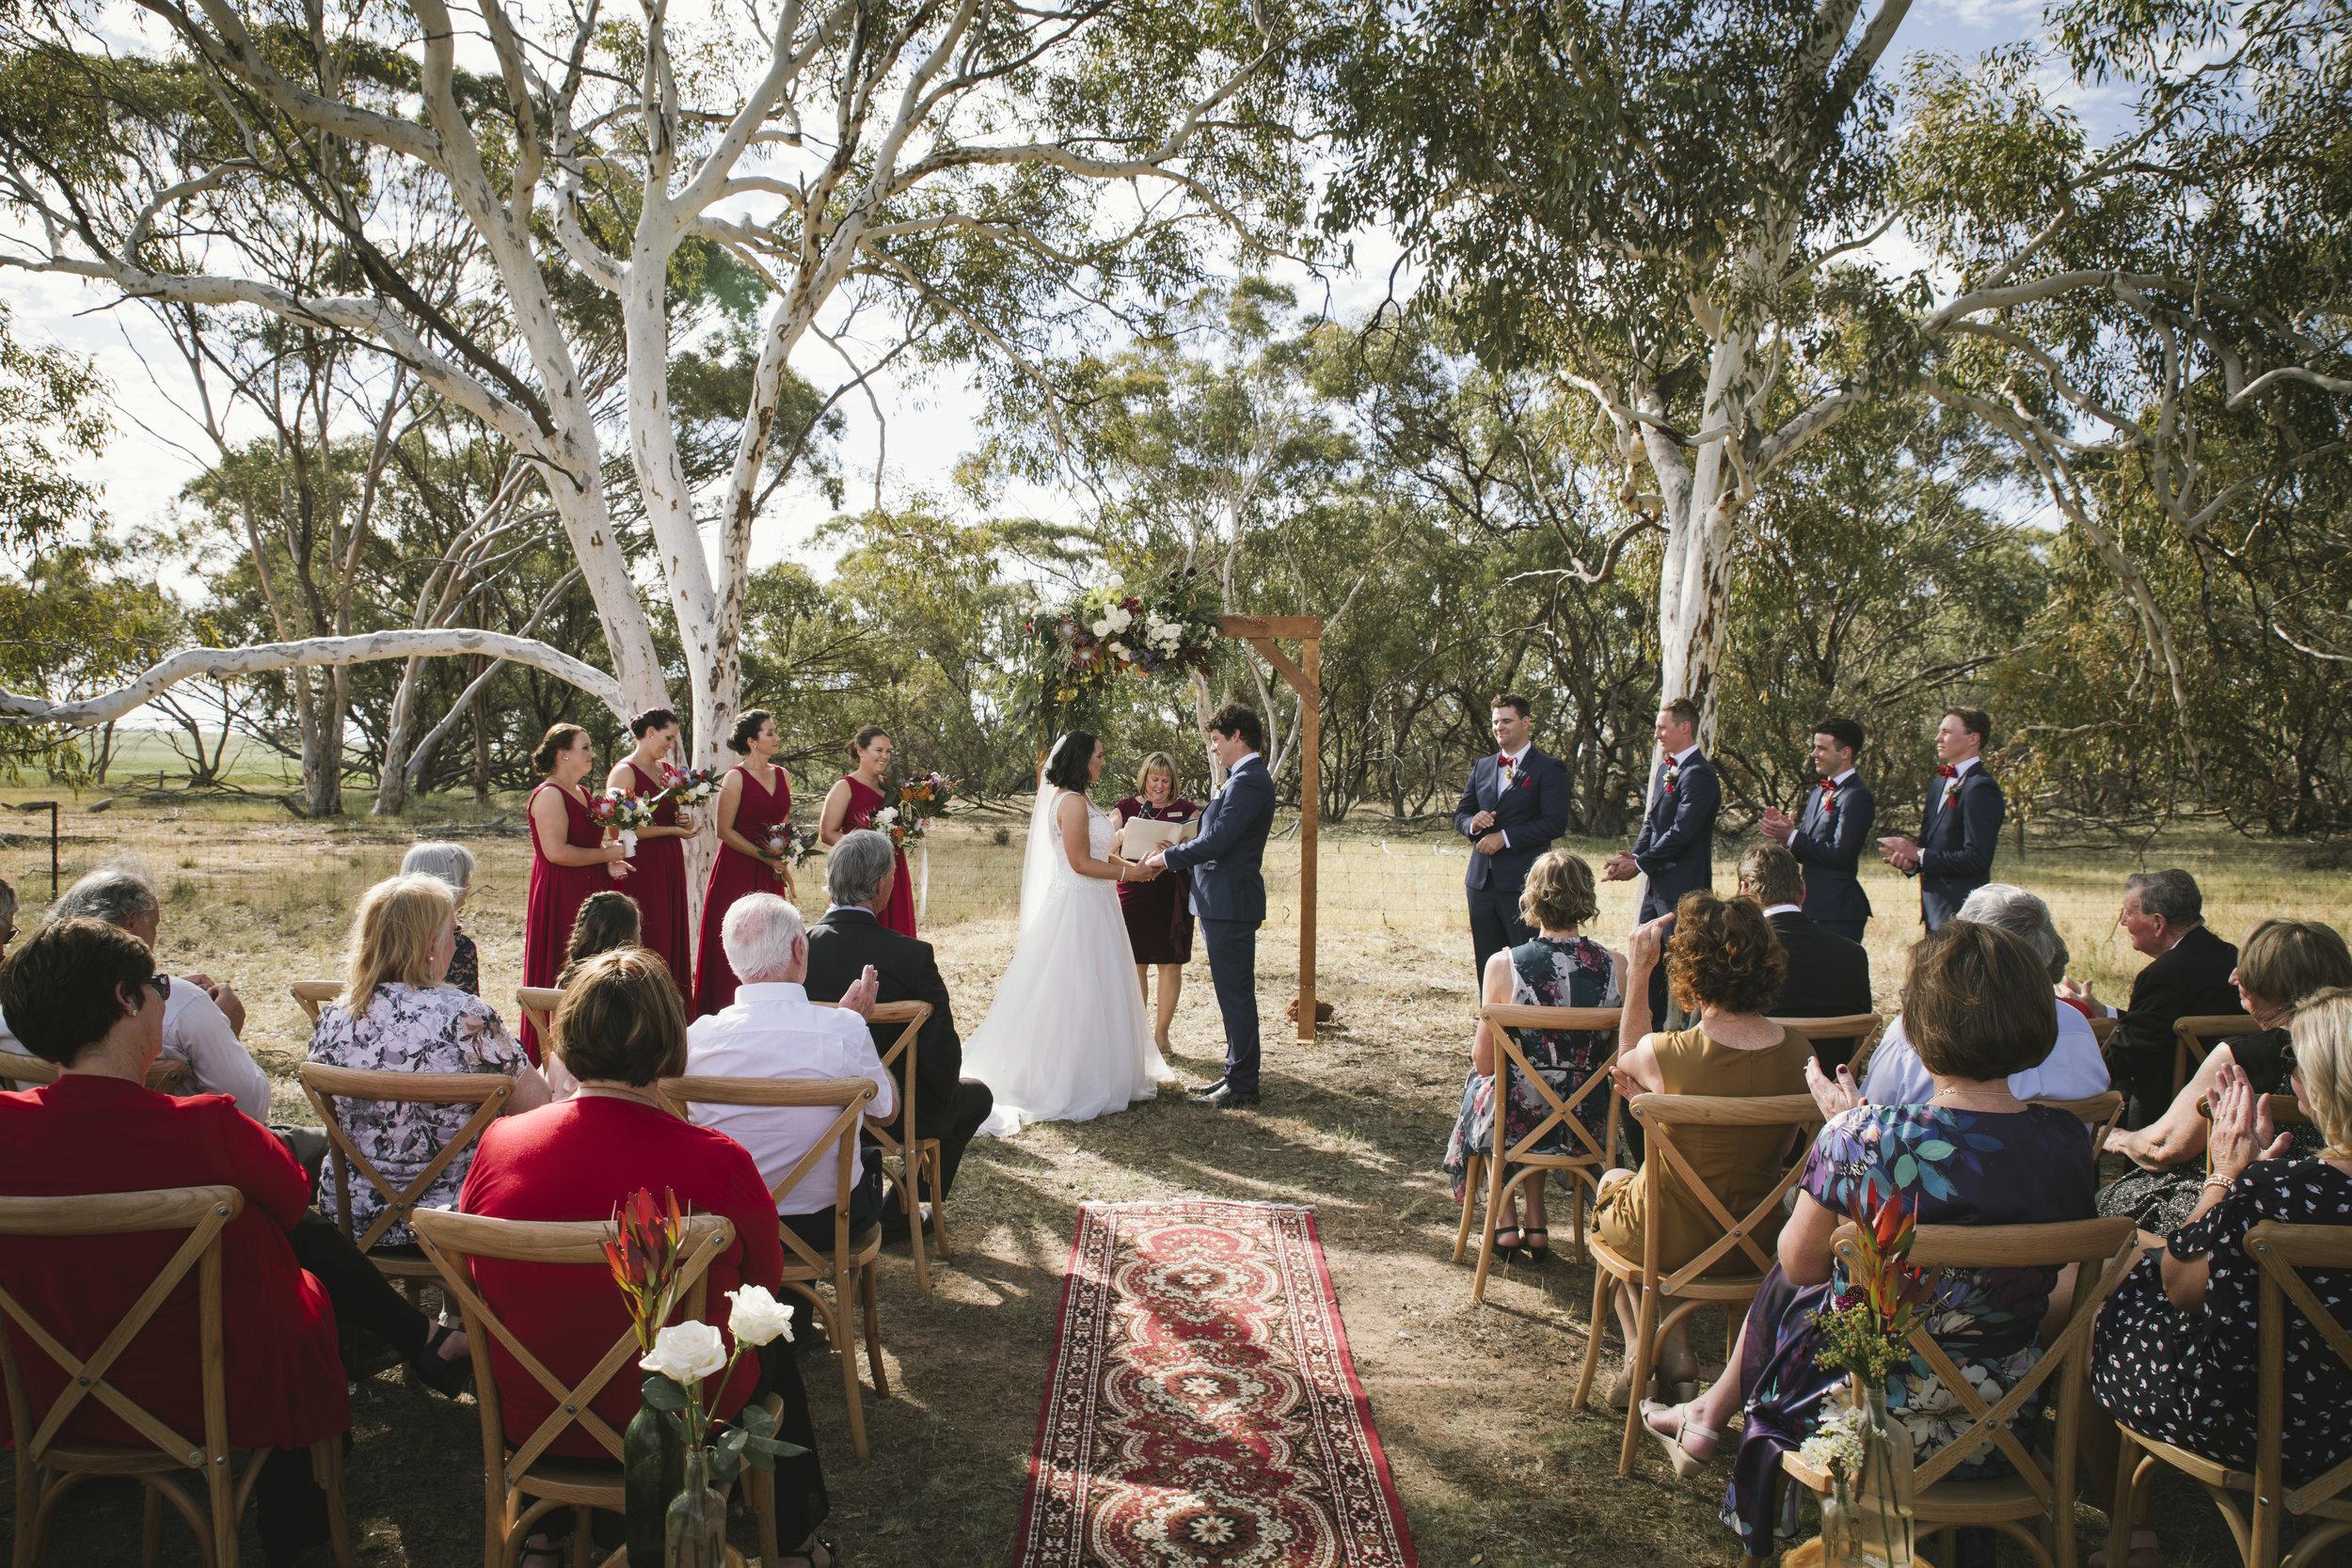 Angie Roe Photography Wheatbelt Avon Valley Farm Wedding (20).jpg